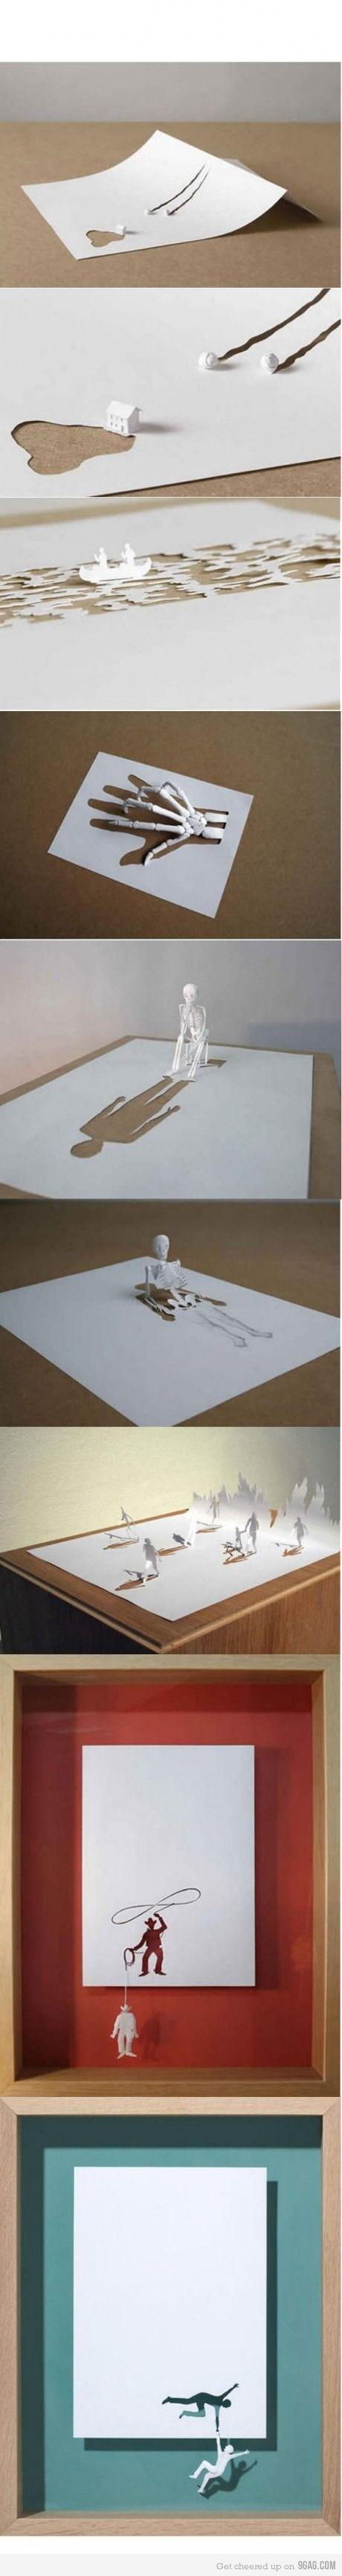 Amazing paper art by Peter Callesen